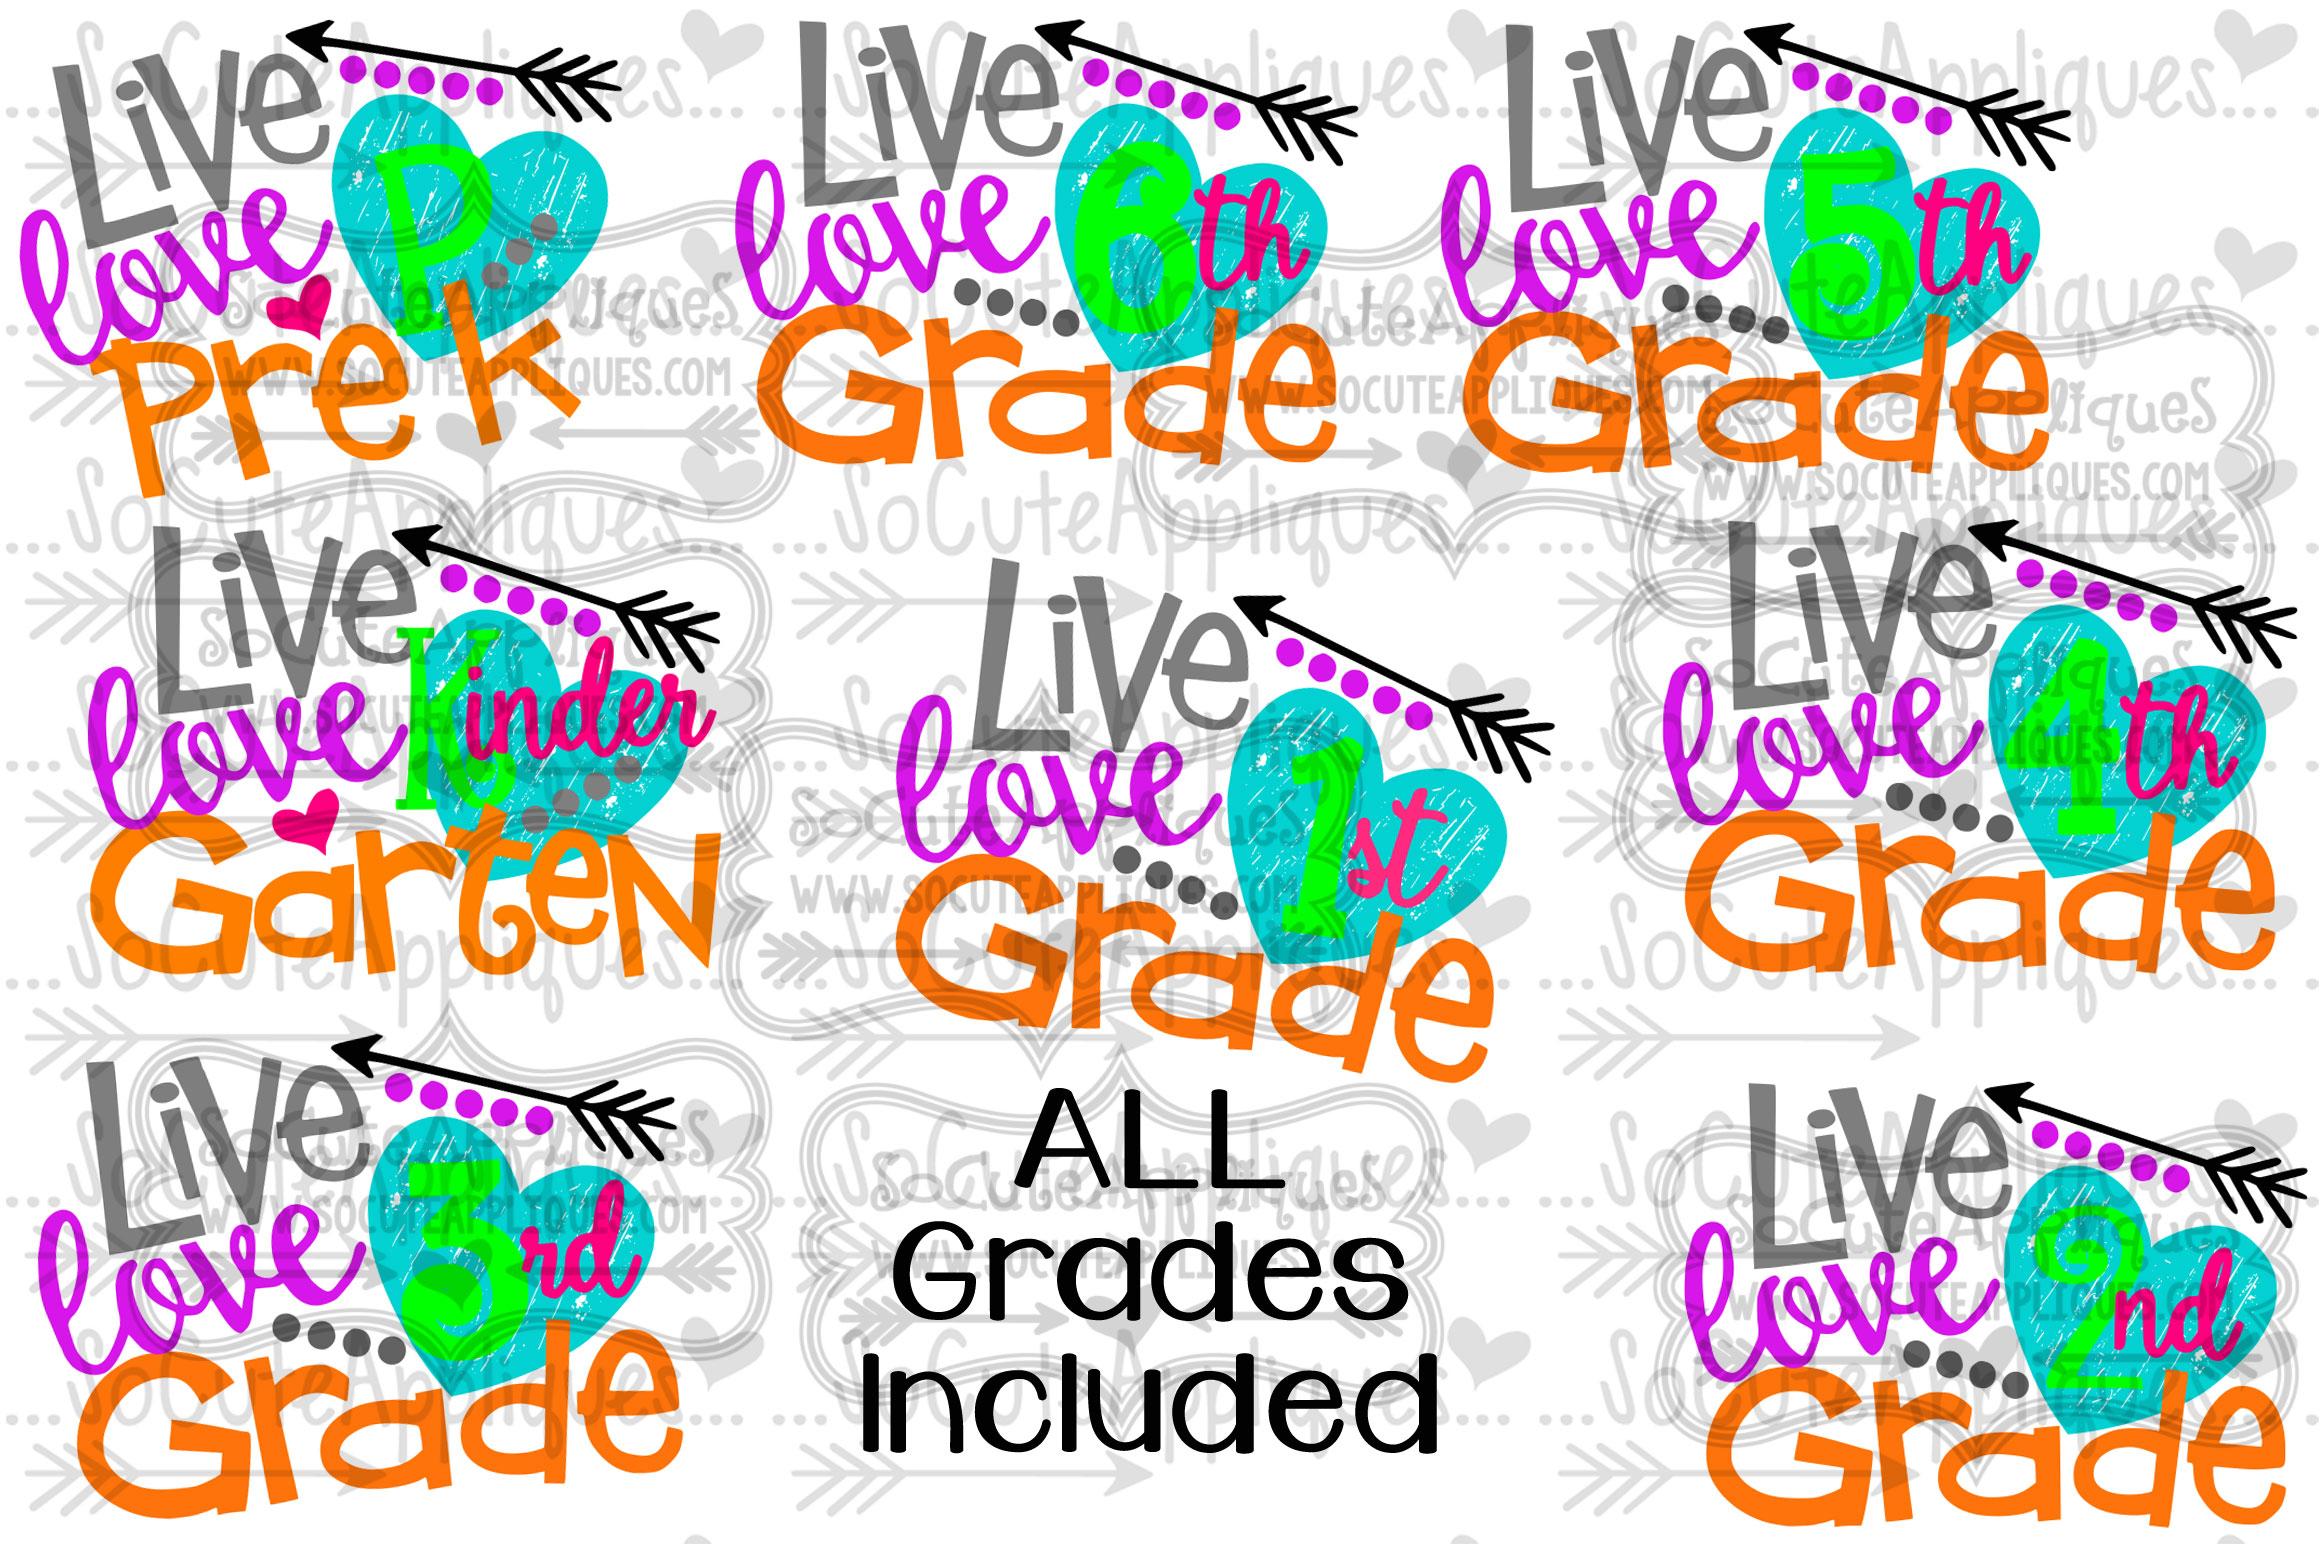 Download Live love grades SVG SCA — socuteappliques.net